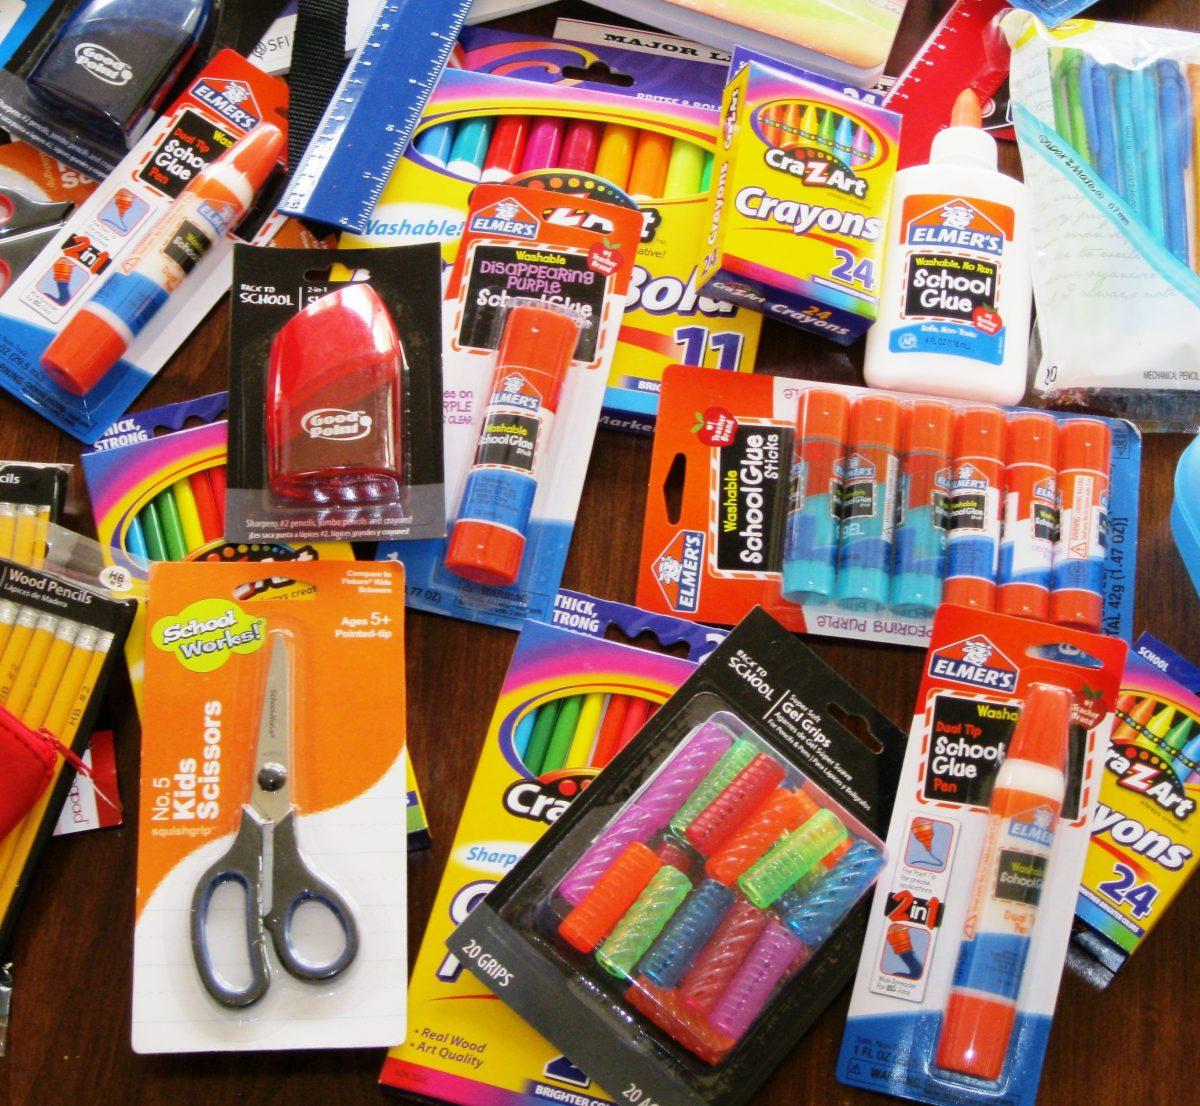 A table full of school supplies - glue sticks, scissors, pencils, etc.